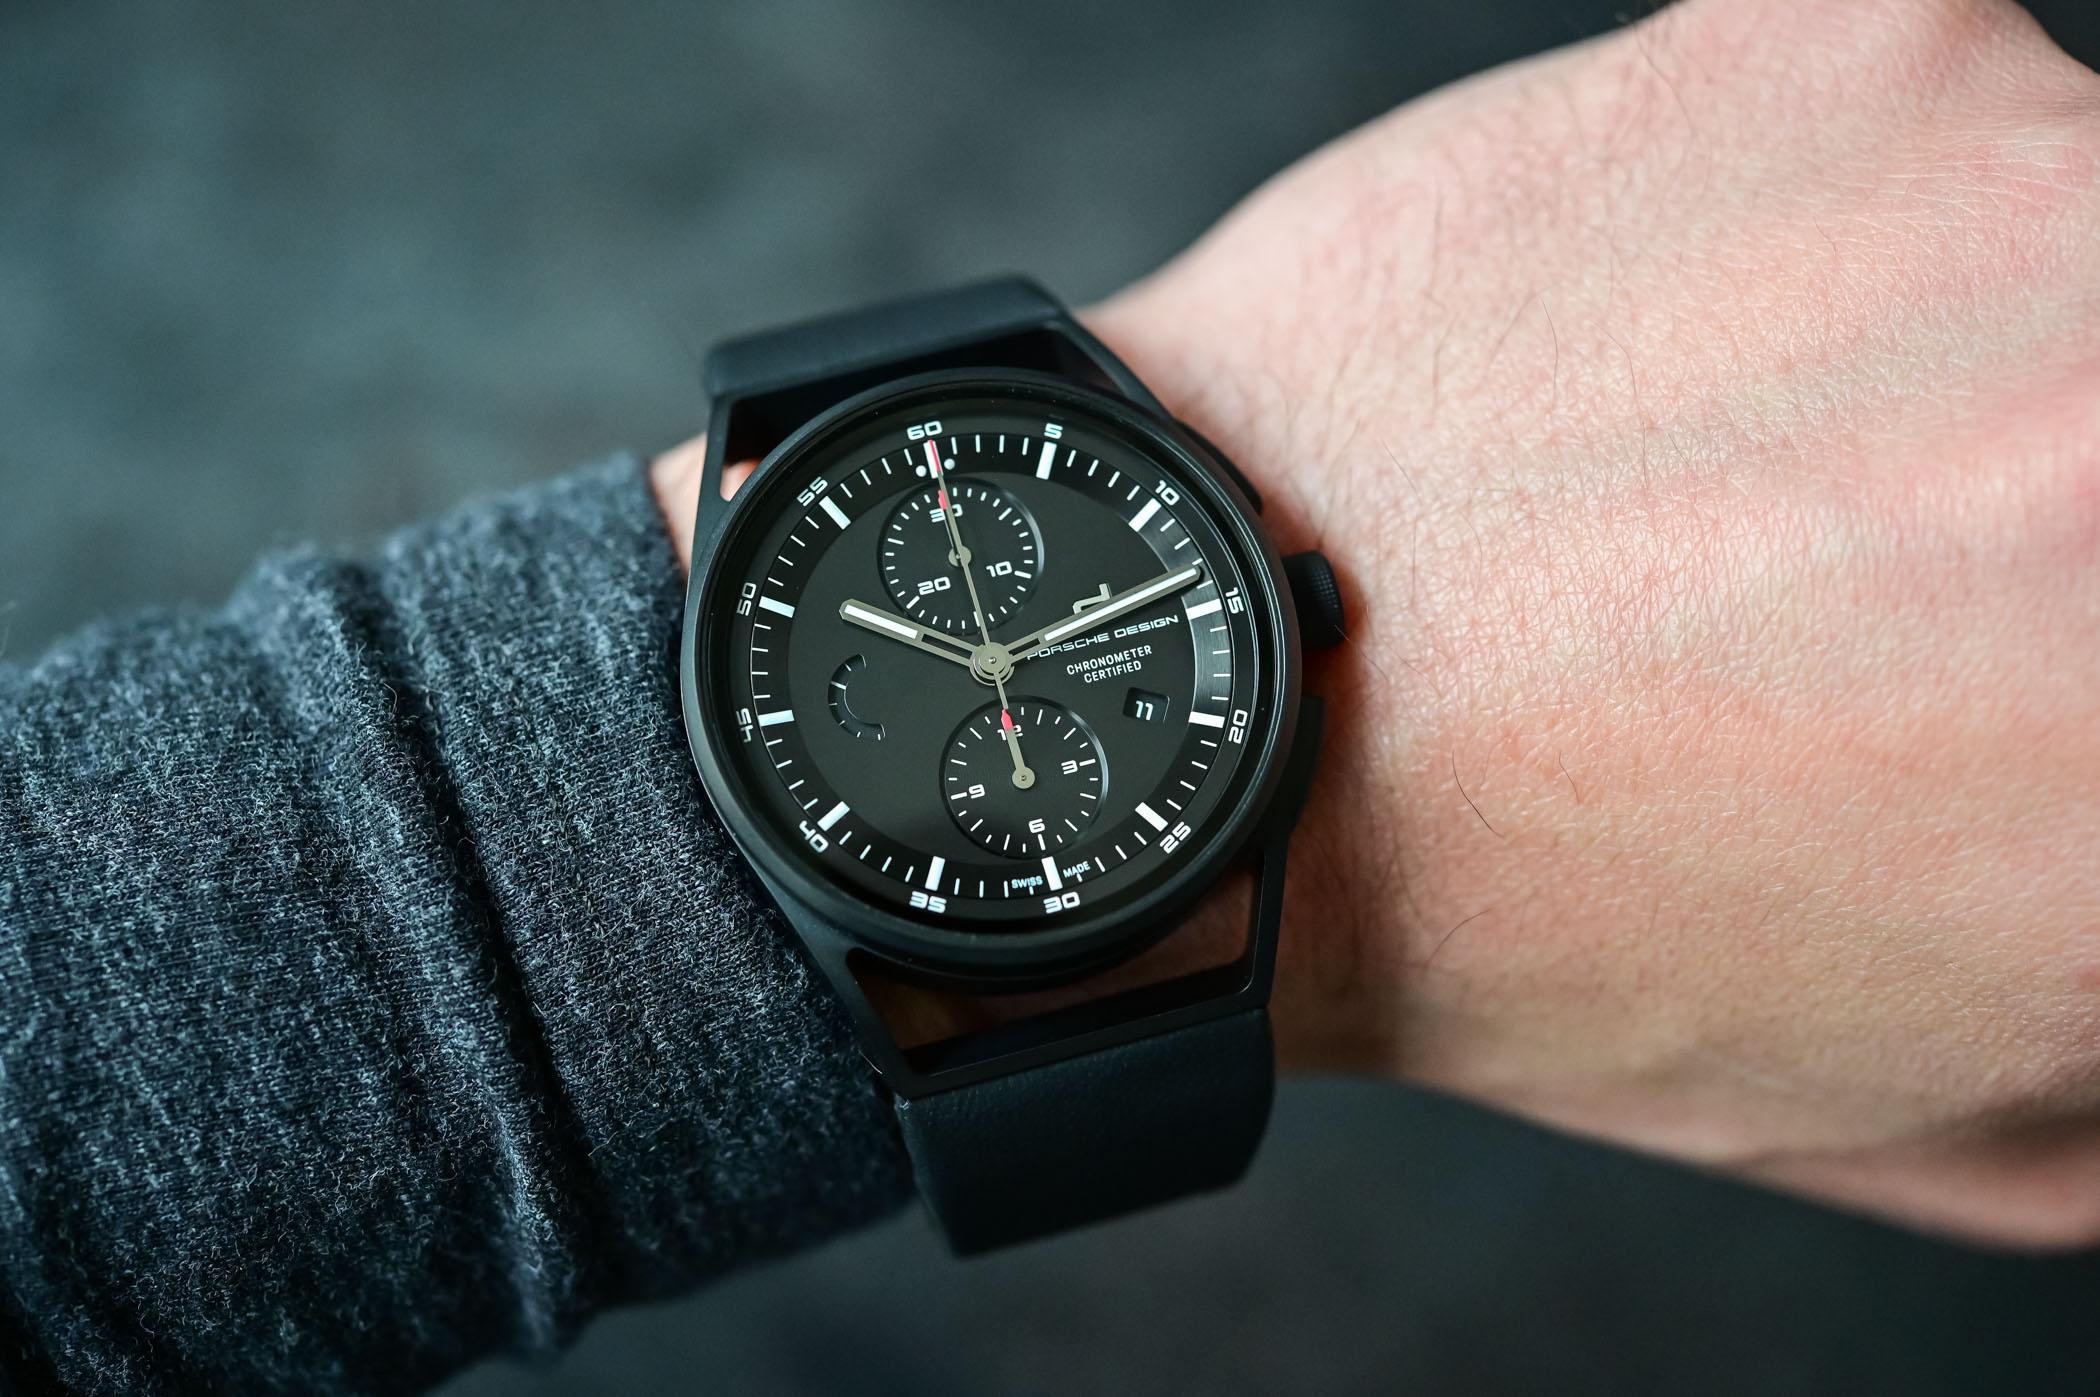 Porsche Design Sports Chrono automatic chronograph